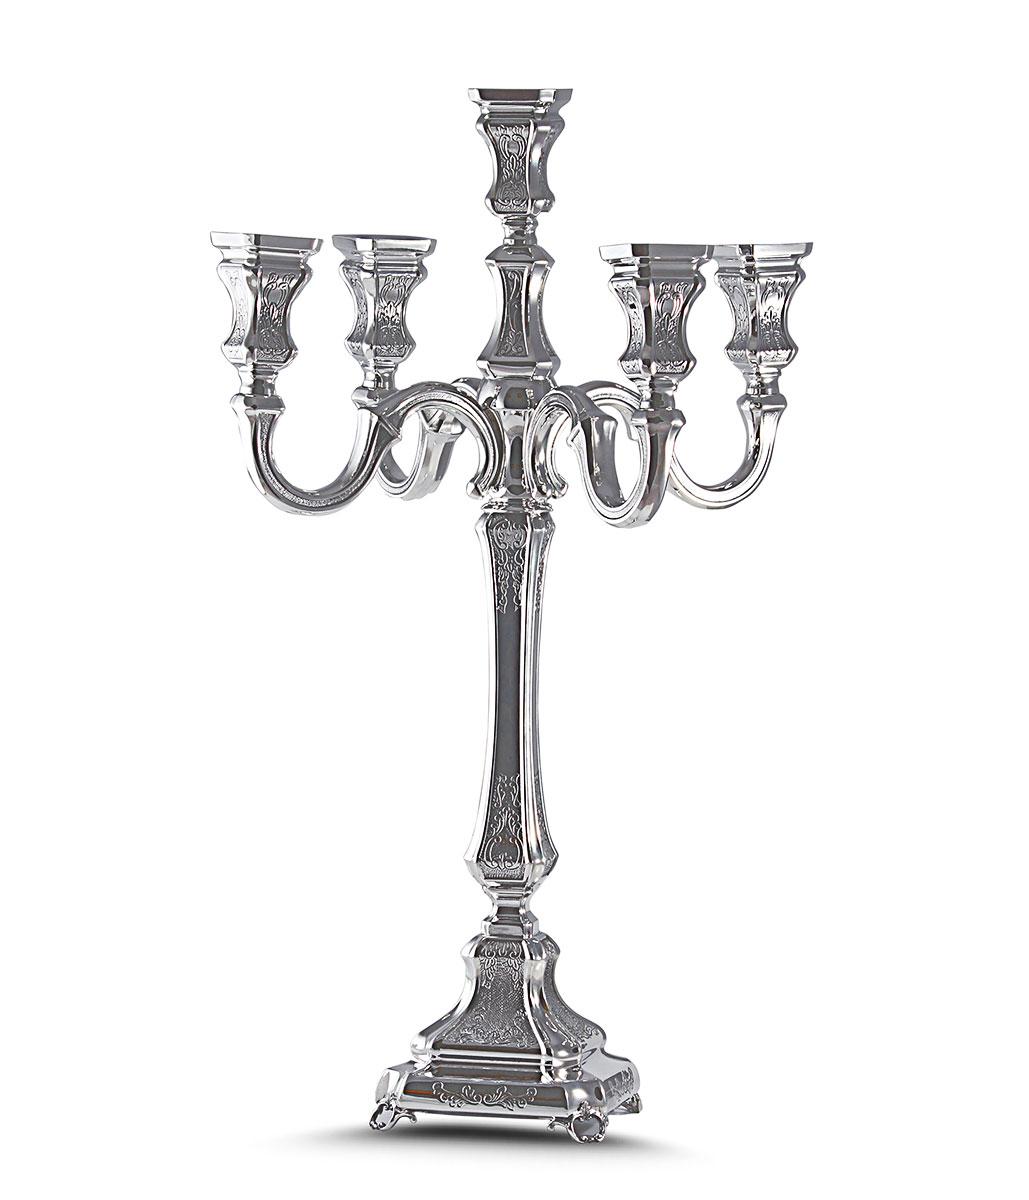 Sterling Silver Candelabra For Shabbat Or Jewish Holidays